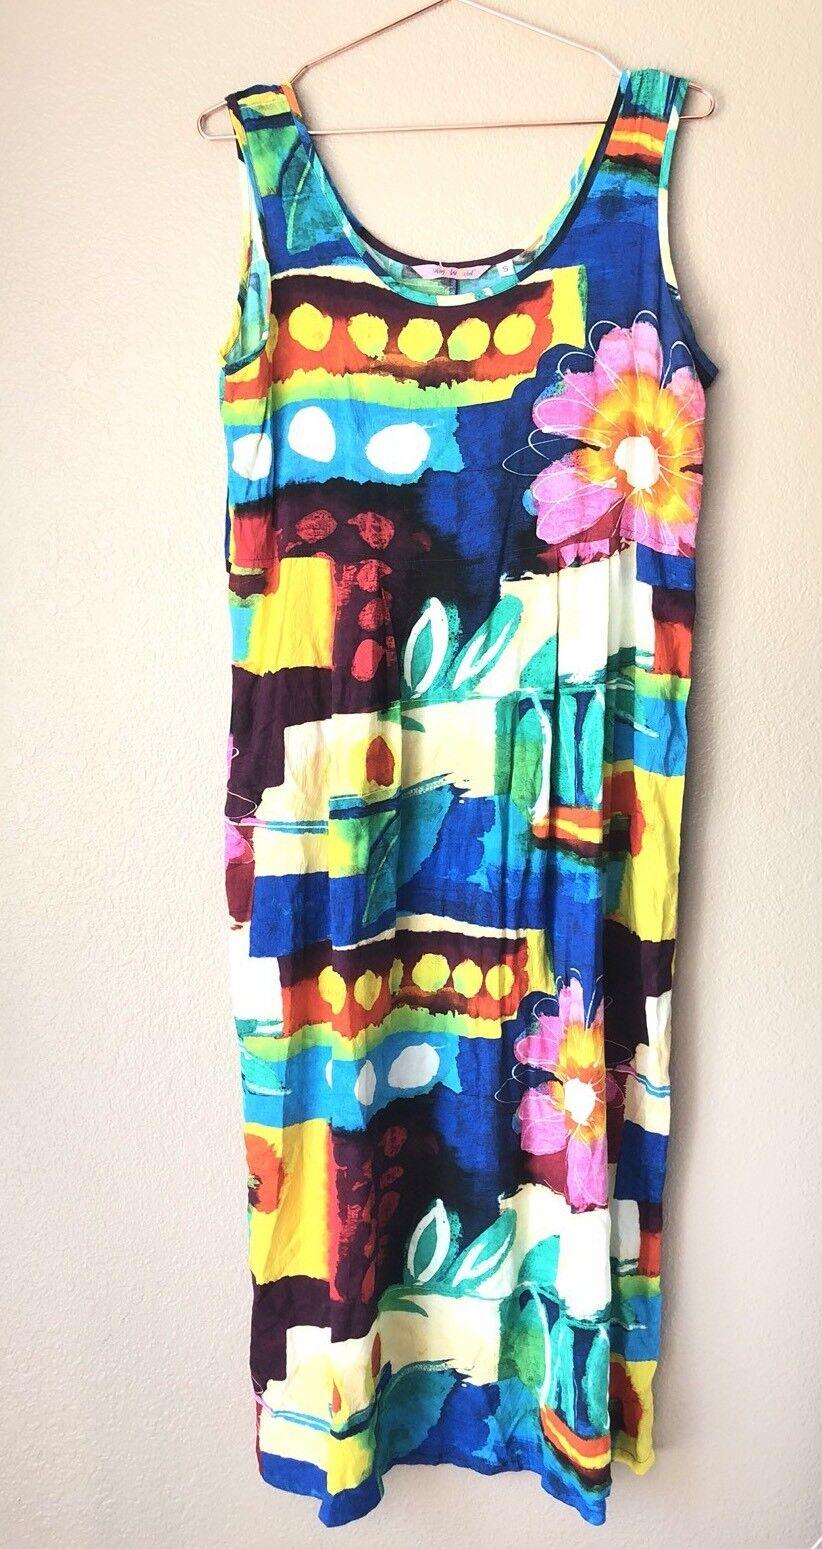 Jams World Floral Abstract Printed Sleeveless Dress Sz S MultiFarbe Pockets